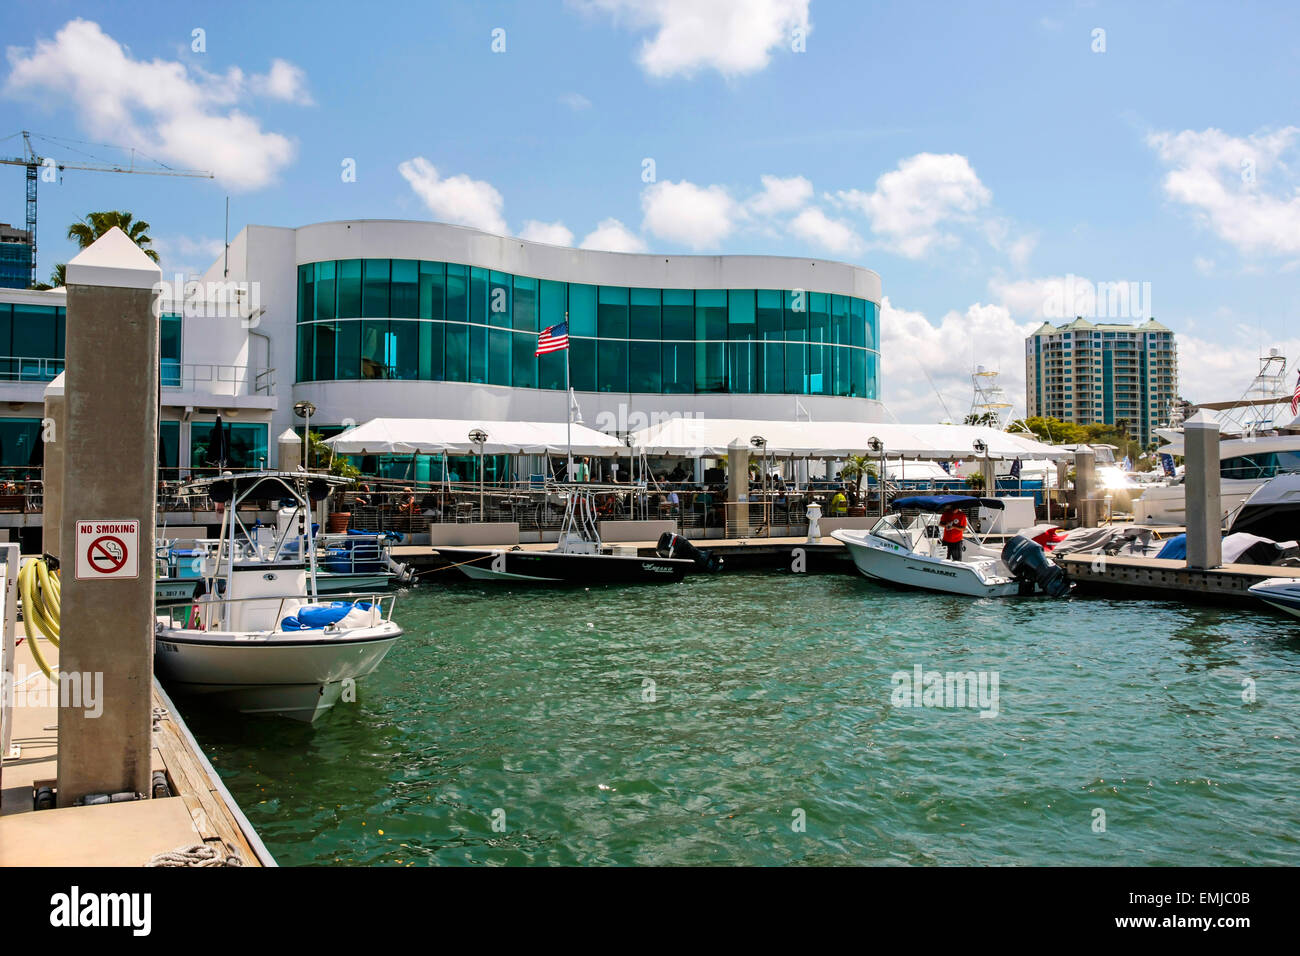 Sarasota Yacht Club >> Marina Jack Restaurant And Sarasota Yacht Club On The Waterfront Of